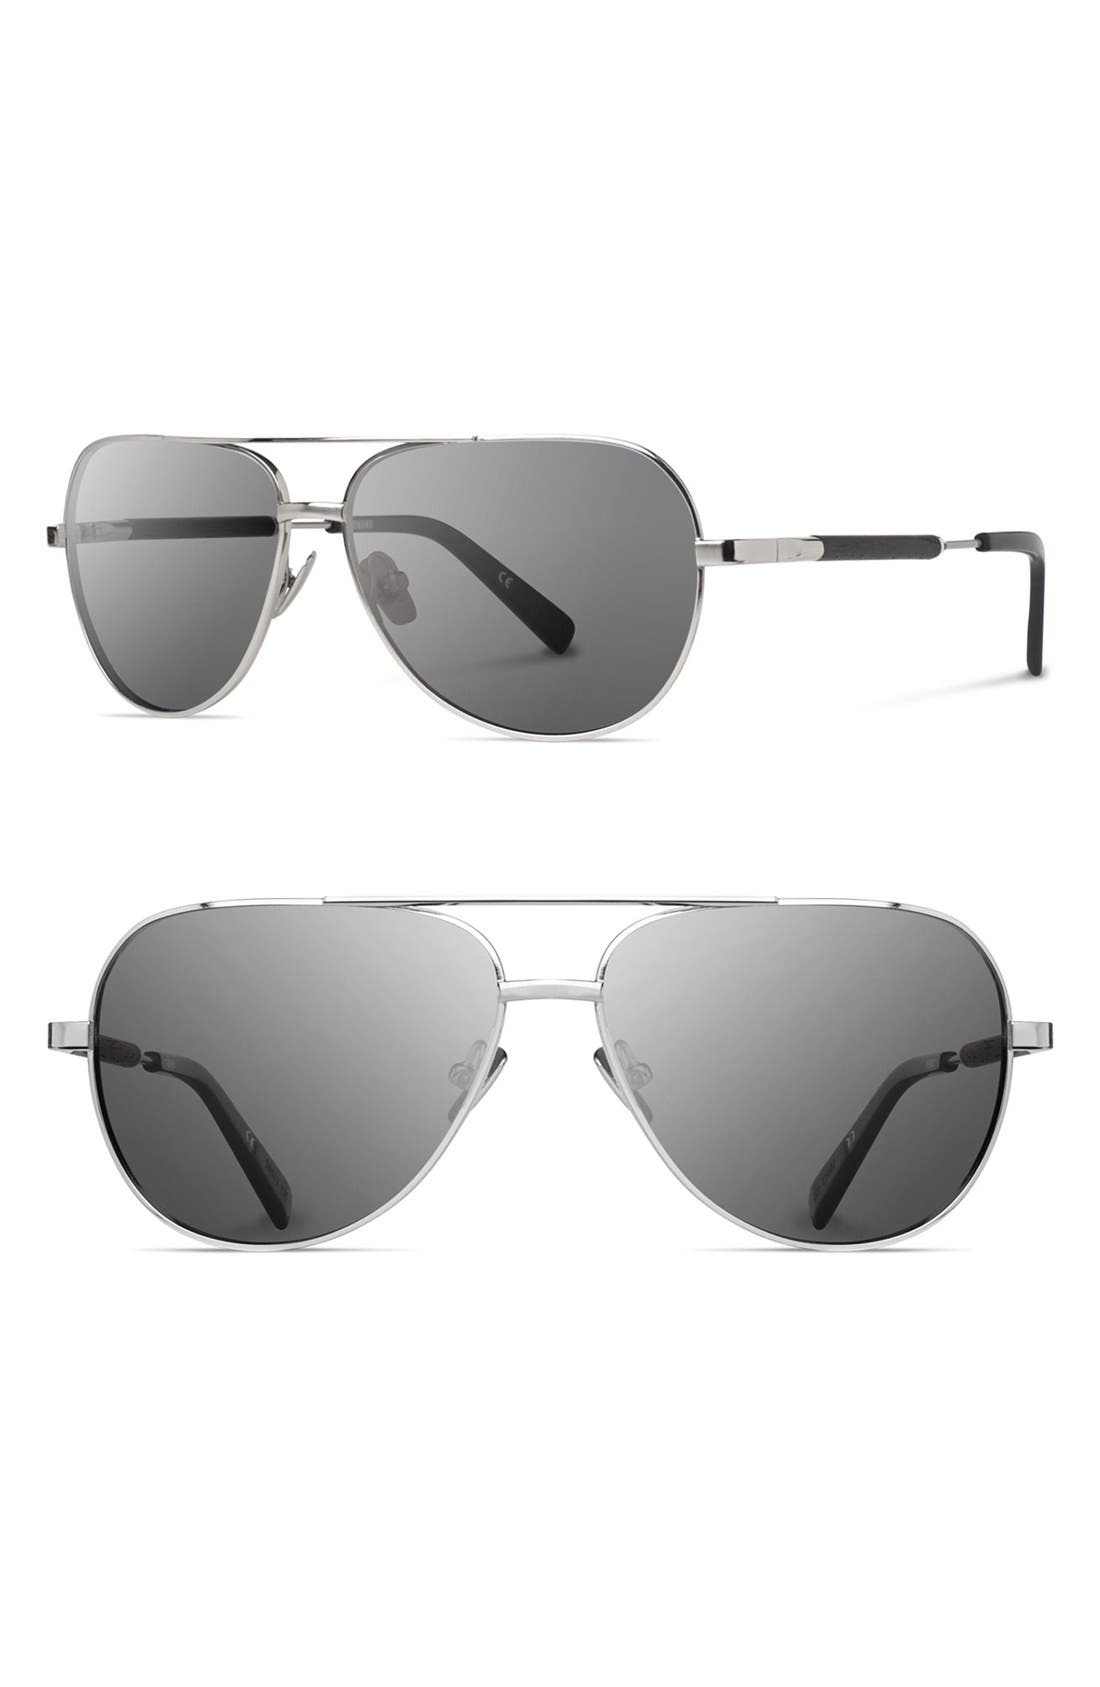 Main Image - Shwood 'Redmond' 53mm Titanium & Wood Aviator Sunglasses